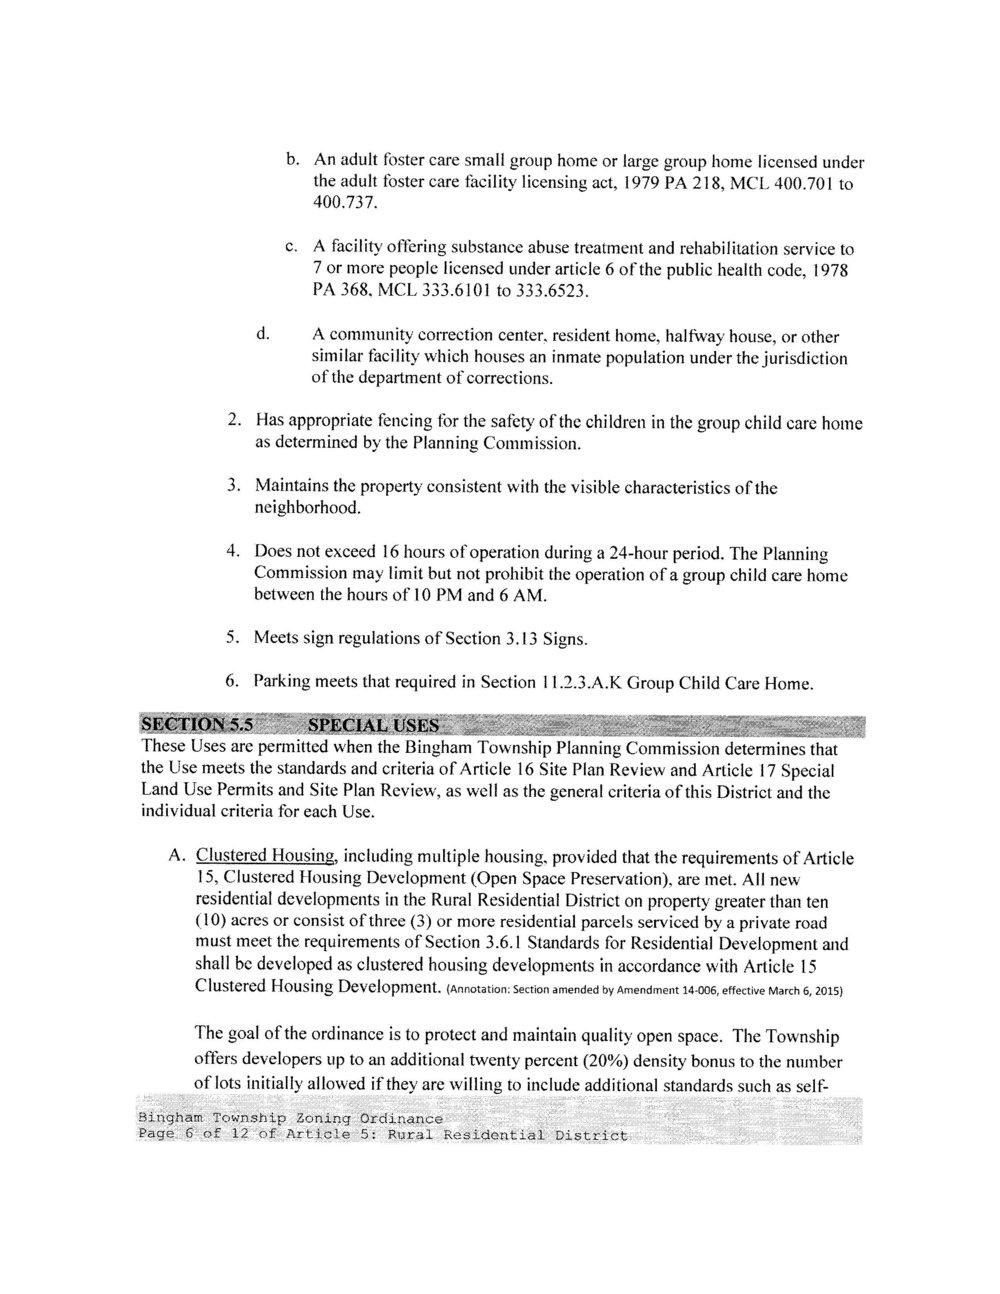 7311 S Lake Leelanau Drive, Traverse City Acreage for sale in Leelanau County by Oltersdorf Realty LLC (24).jpg